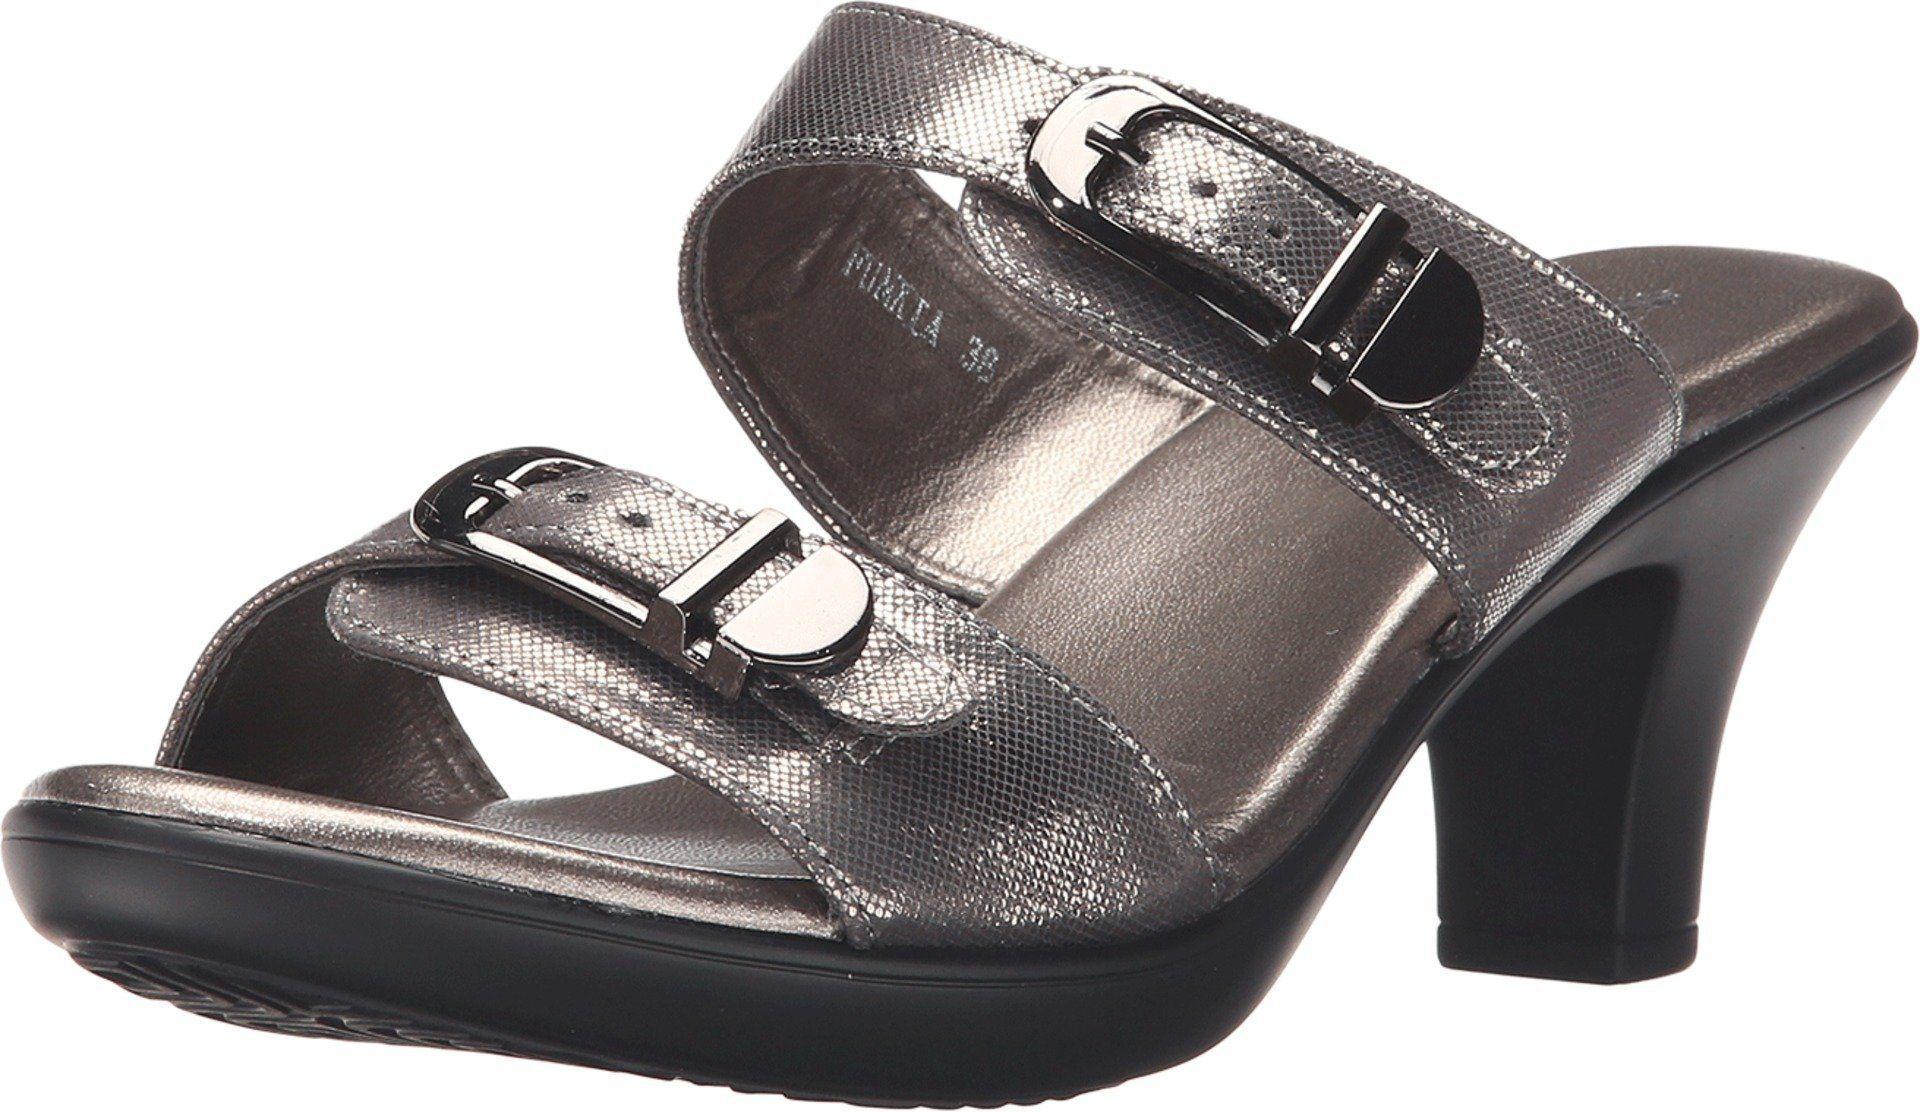 Womens Sandals PATRIZIA Funkia Pewter